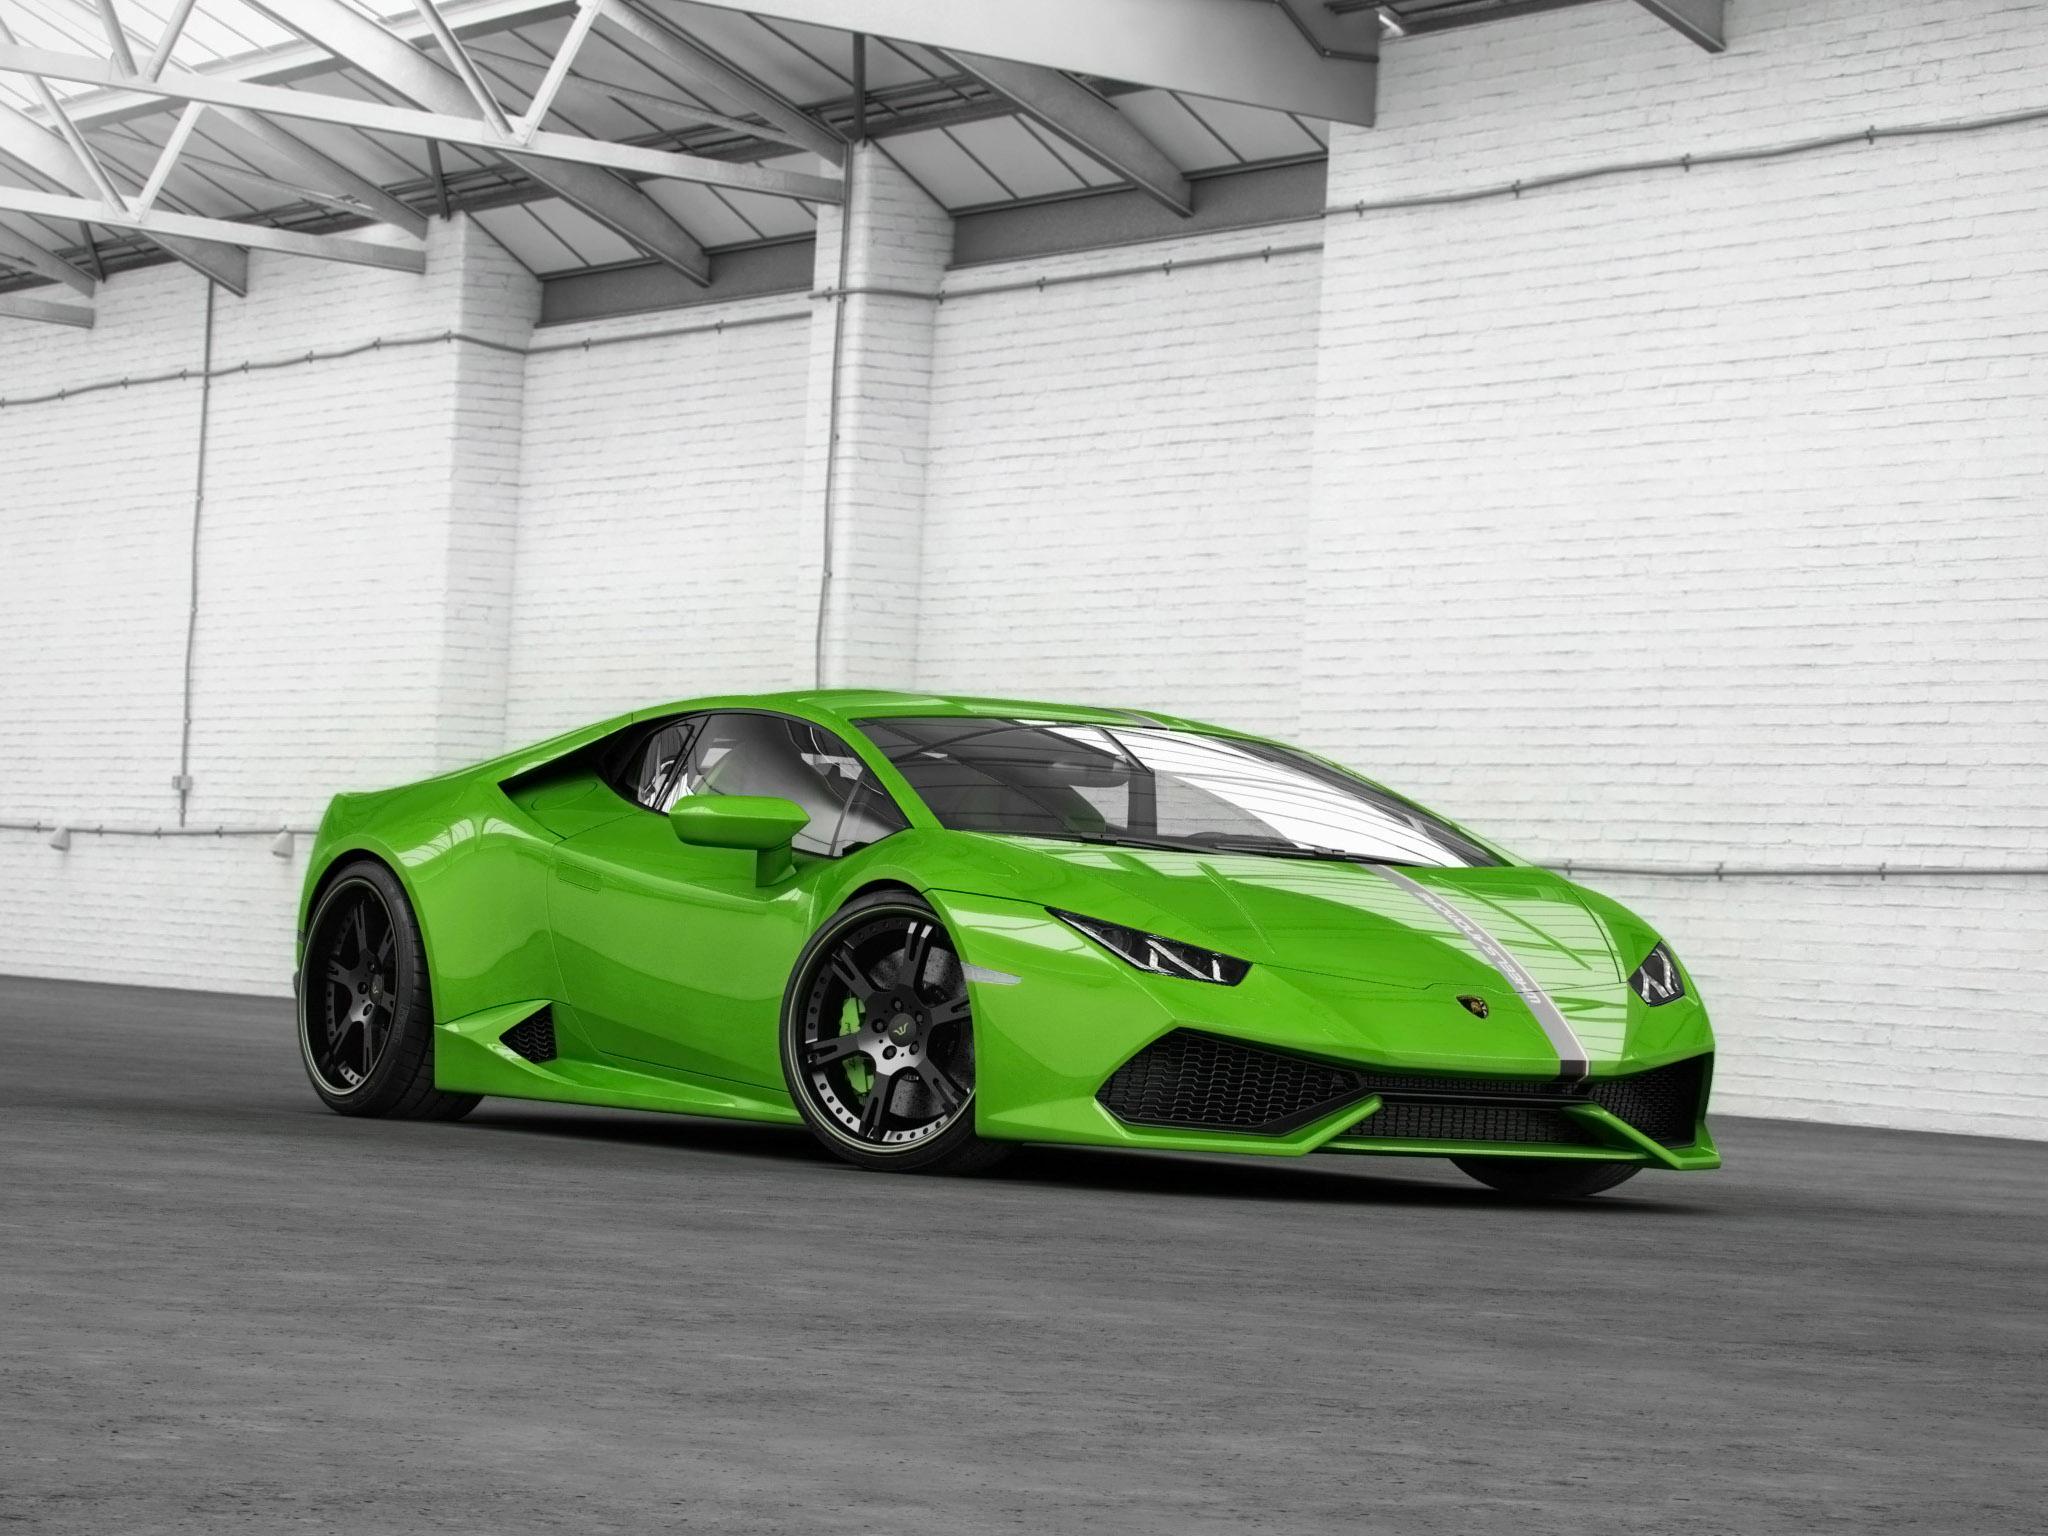 2015 Wheelsandmore Lamborghini Huracan